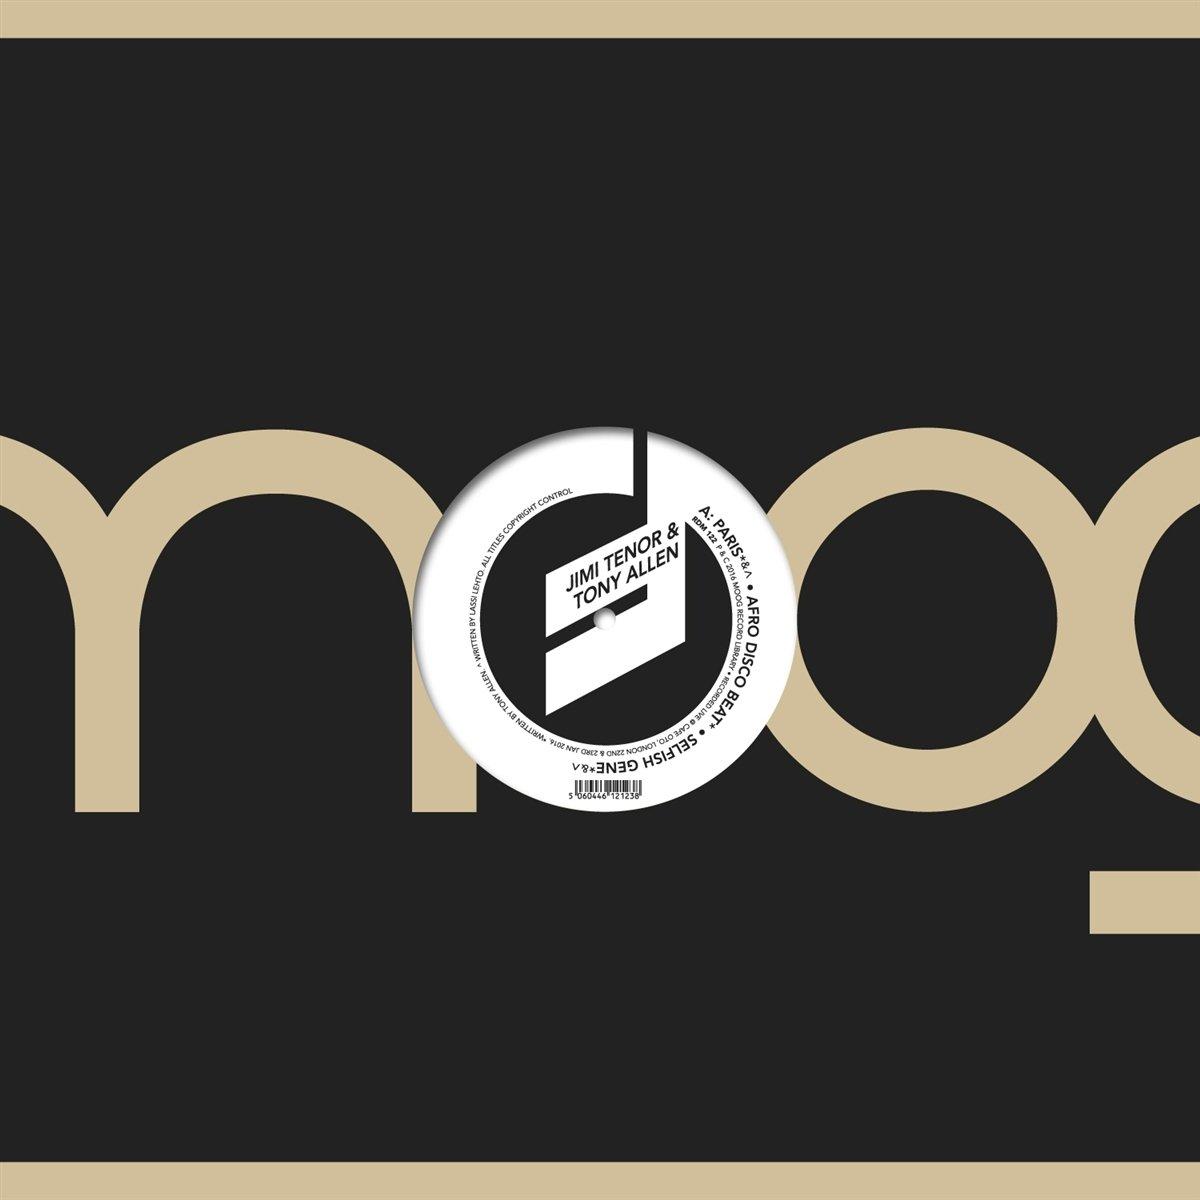 Vinilo : TENOR, JIMI / ALLEN, TONY - Moogin At The Cafe (oto Live Series) (LP Vinyl)